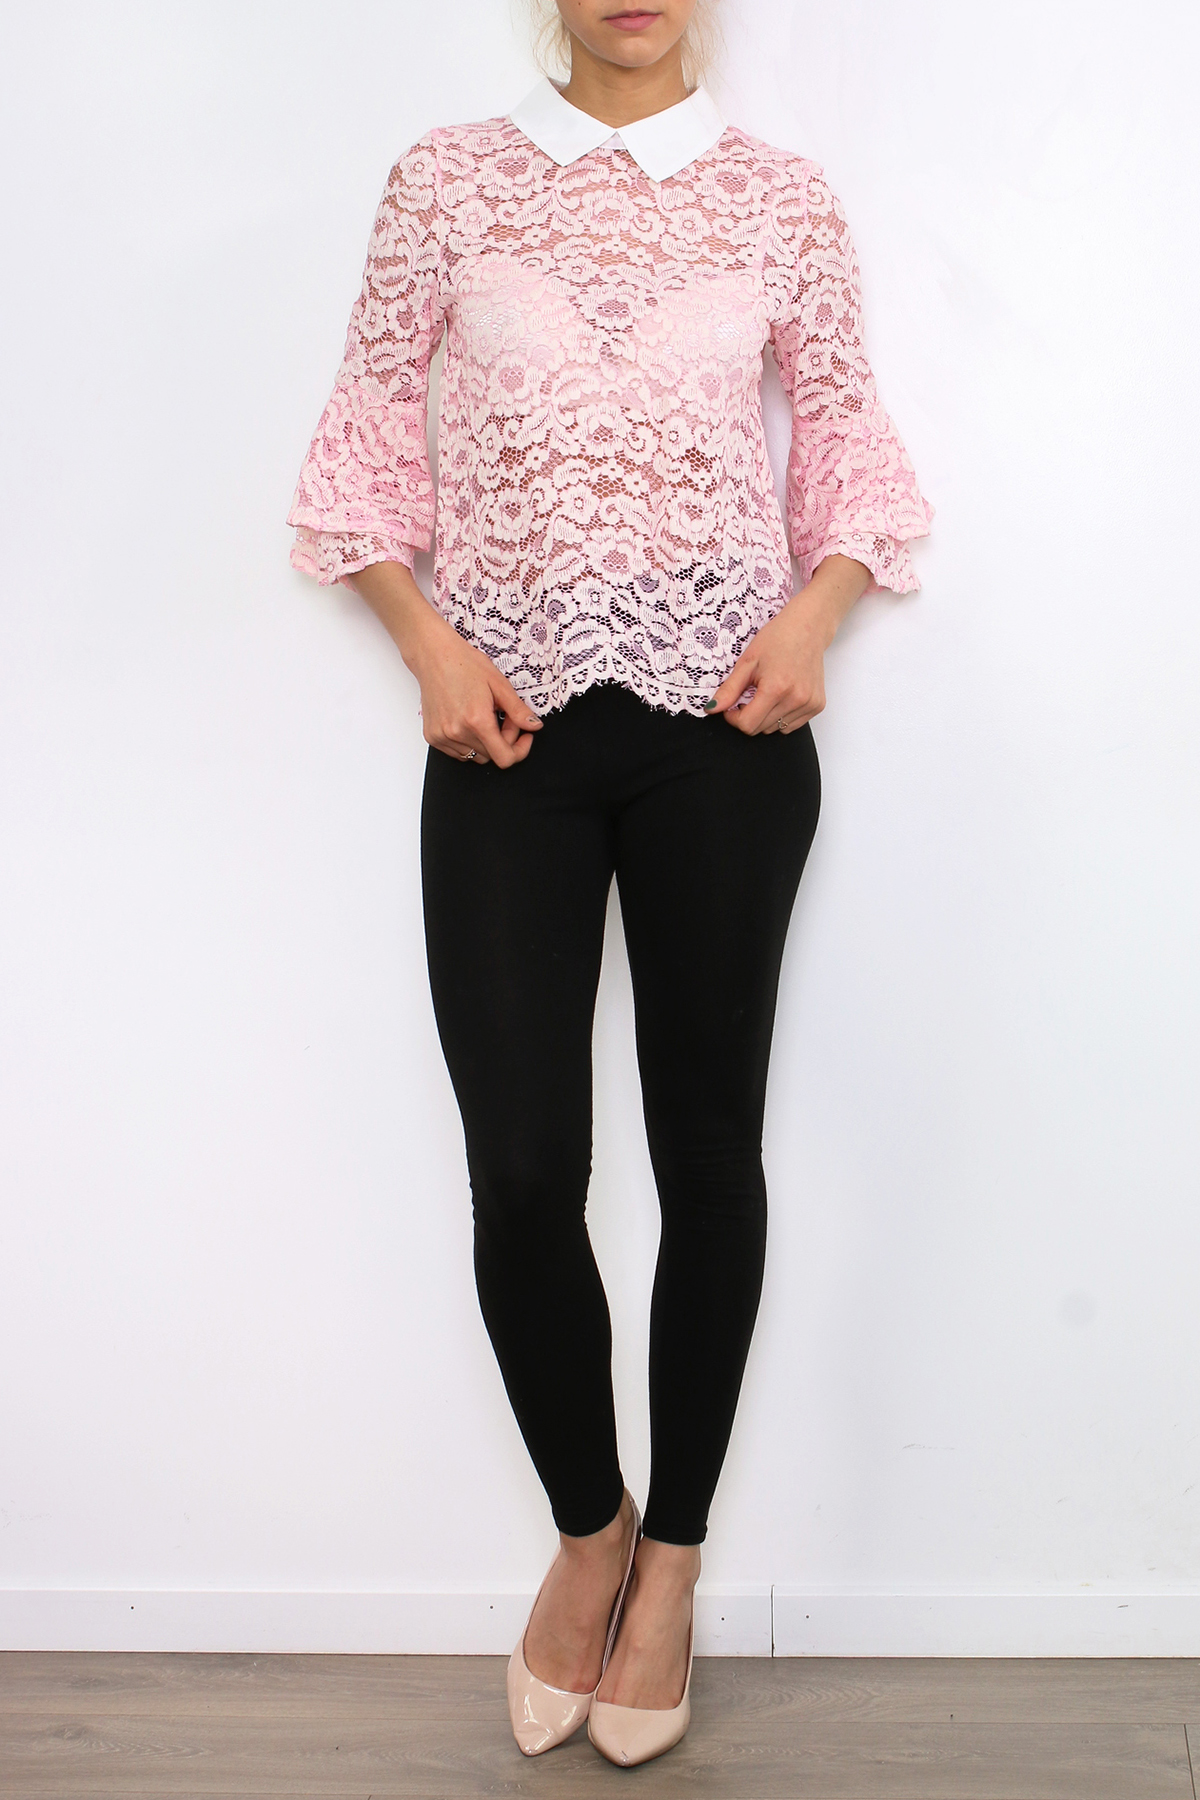 Tops & T-shirts Femme OY8002-ROSE C.M.P.55 (sarl GDCY)